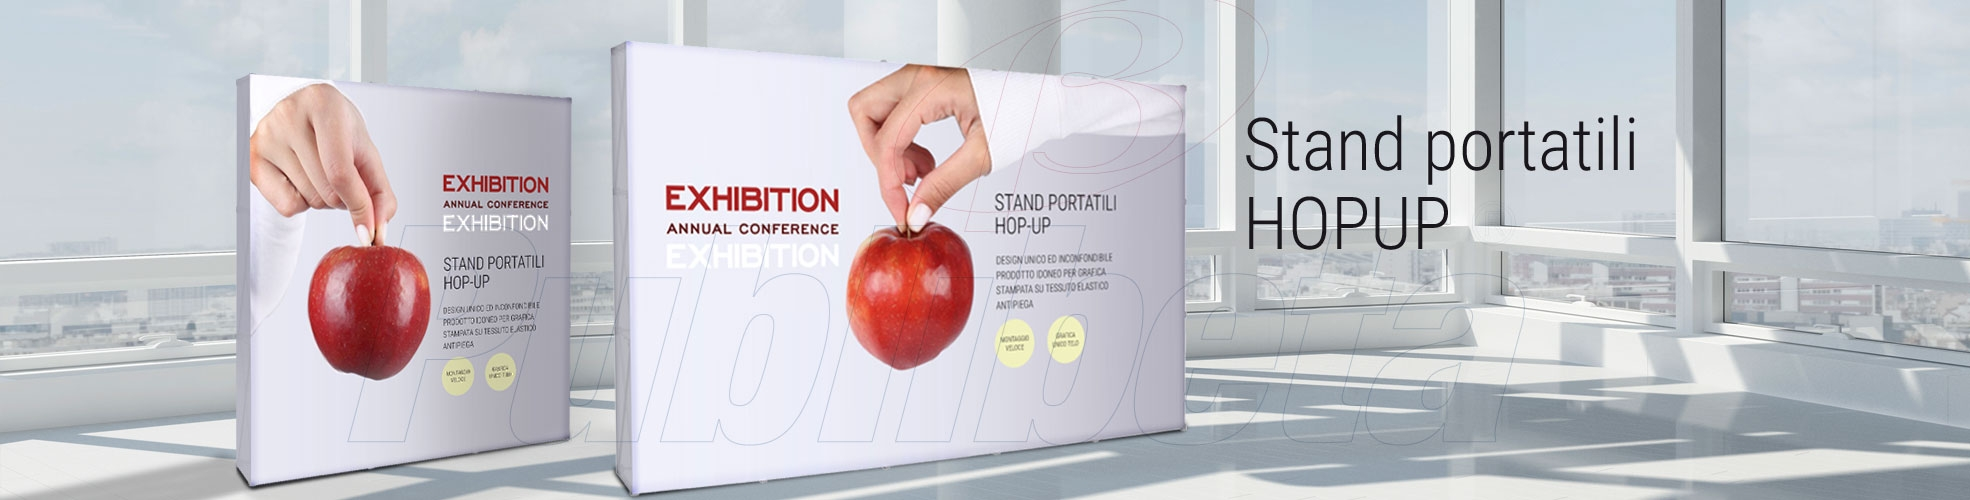 stand portatili hopup